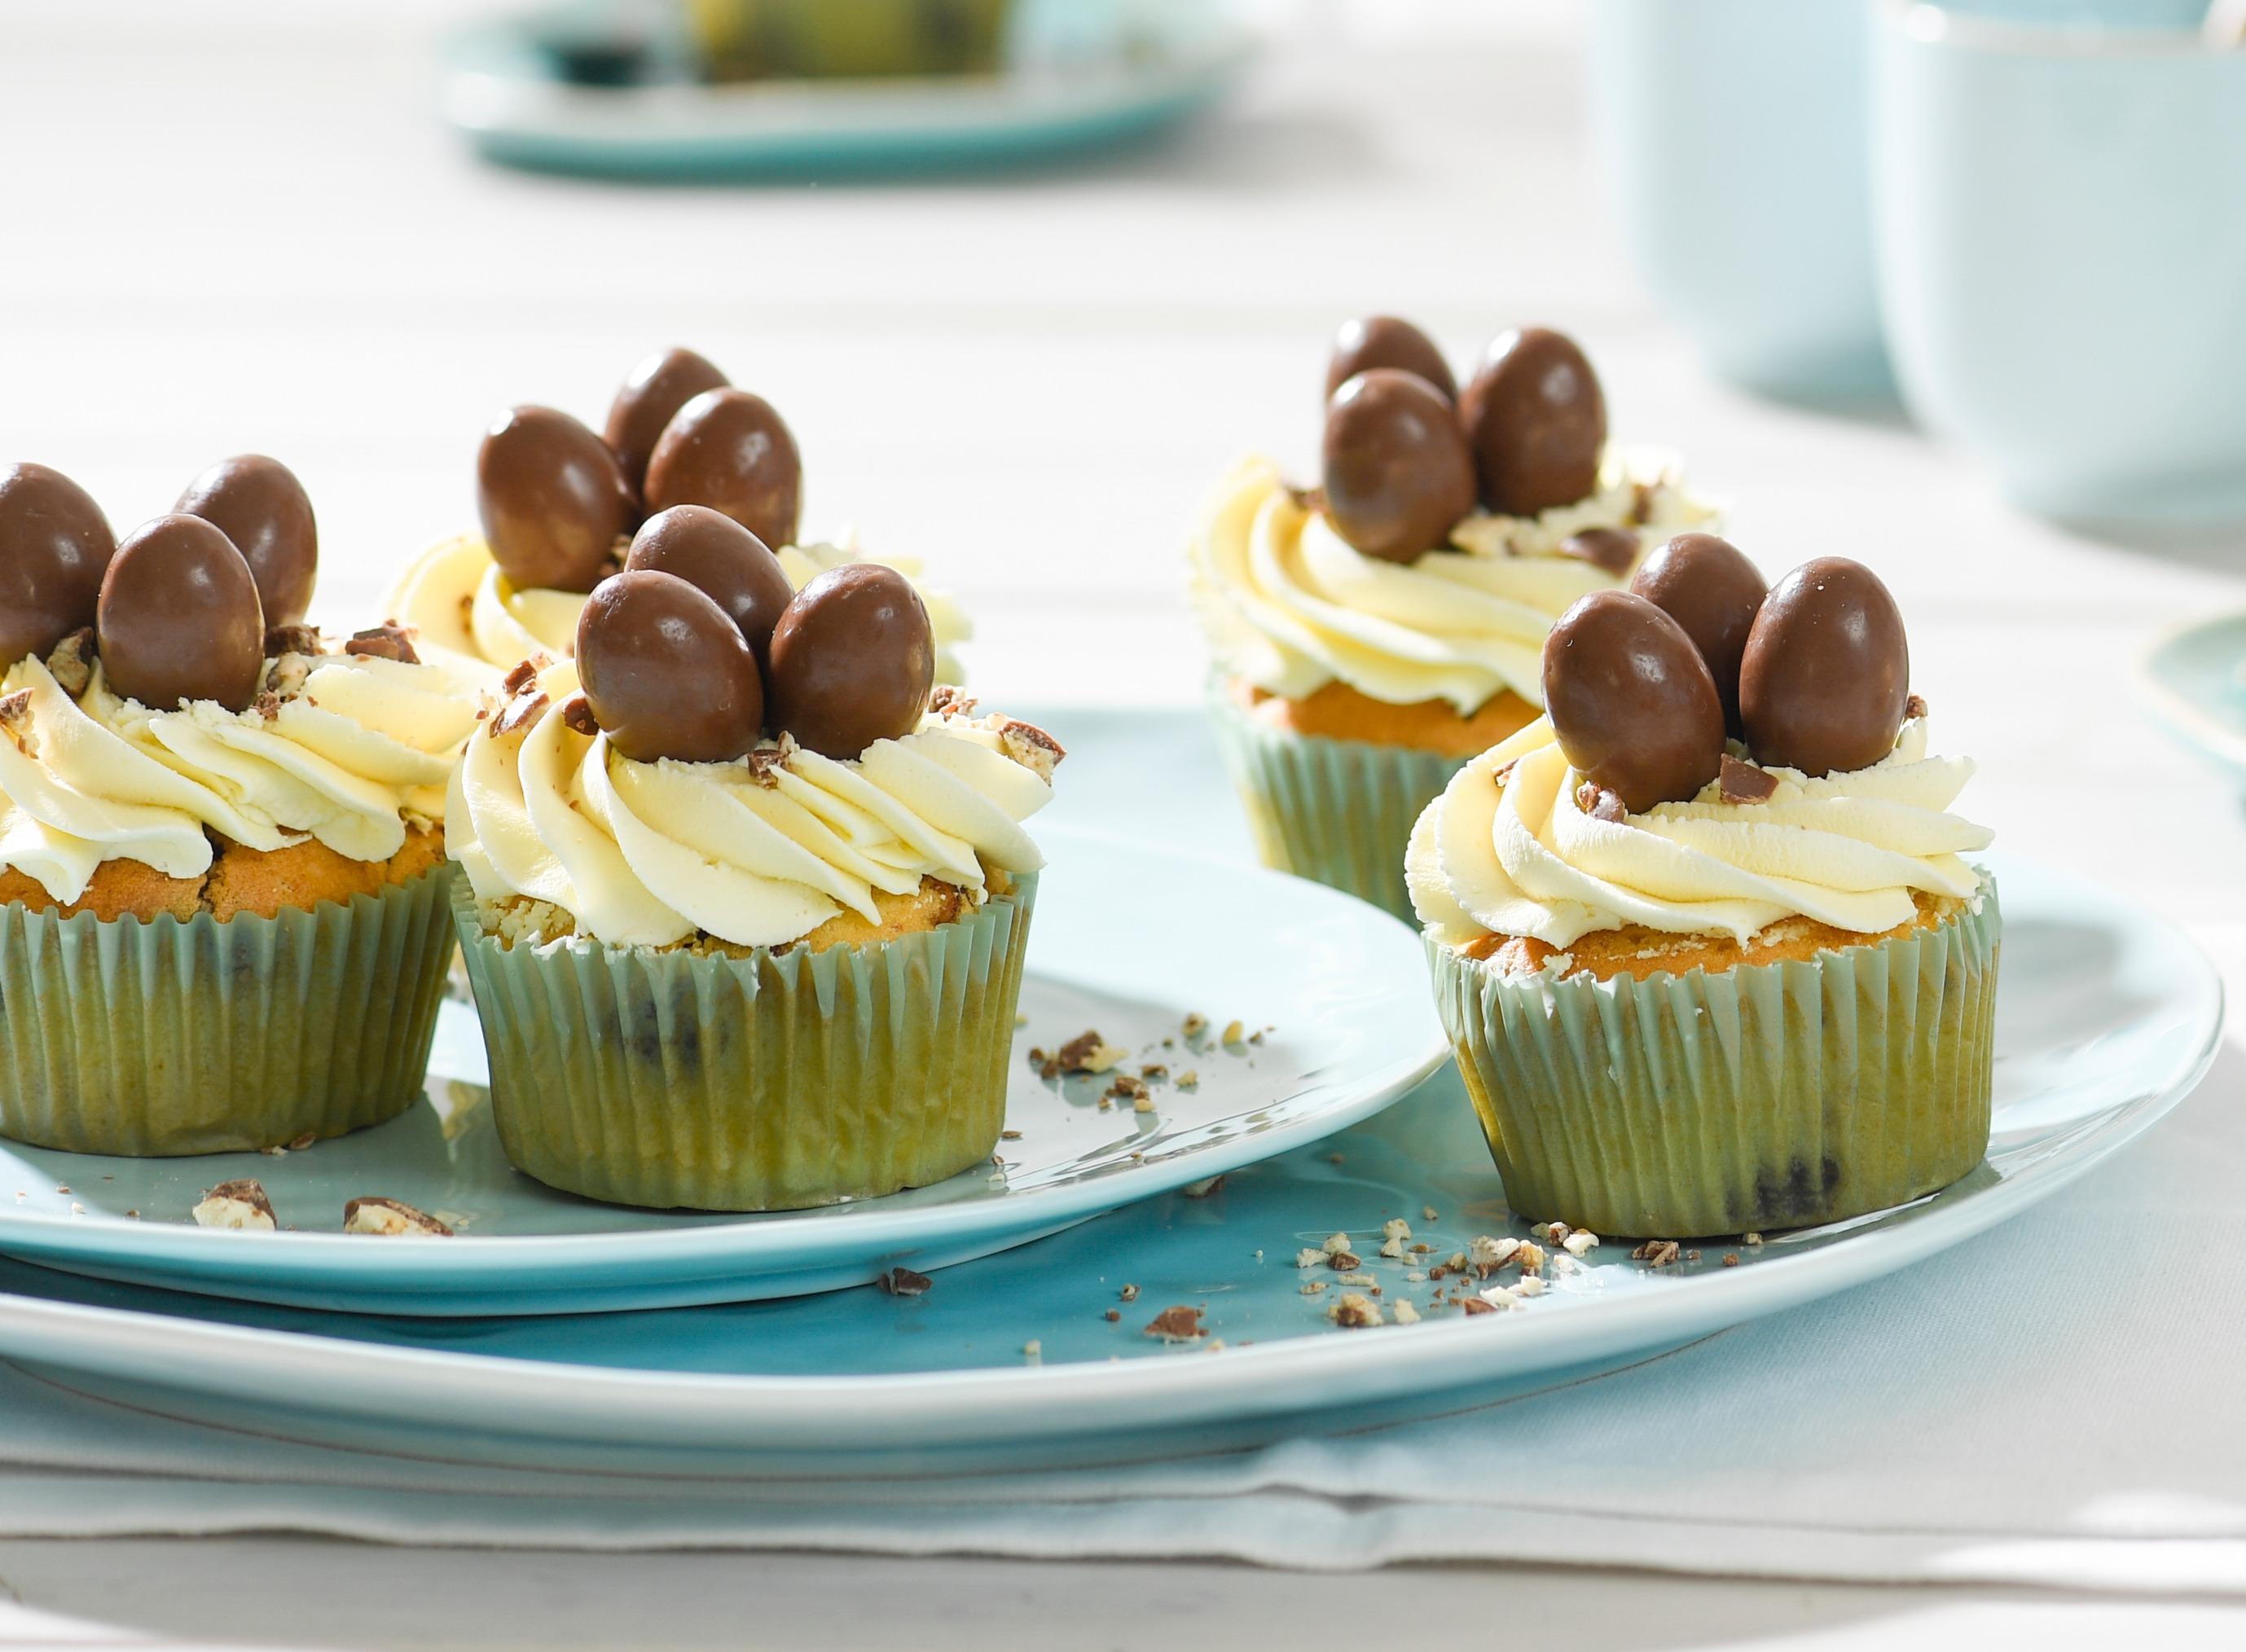 Kinder Schoko Bon Cupcakes Rezept Von Backen De